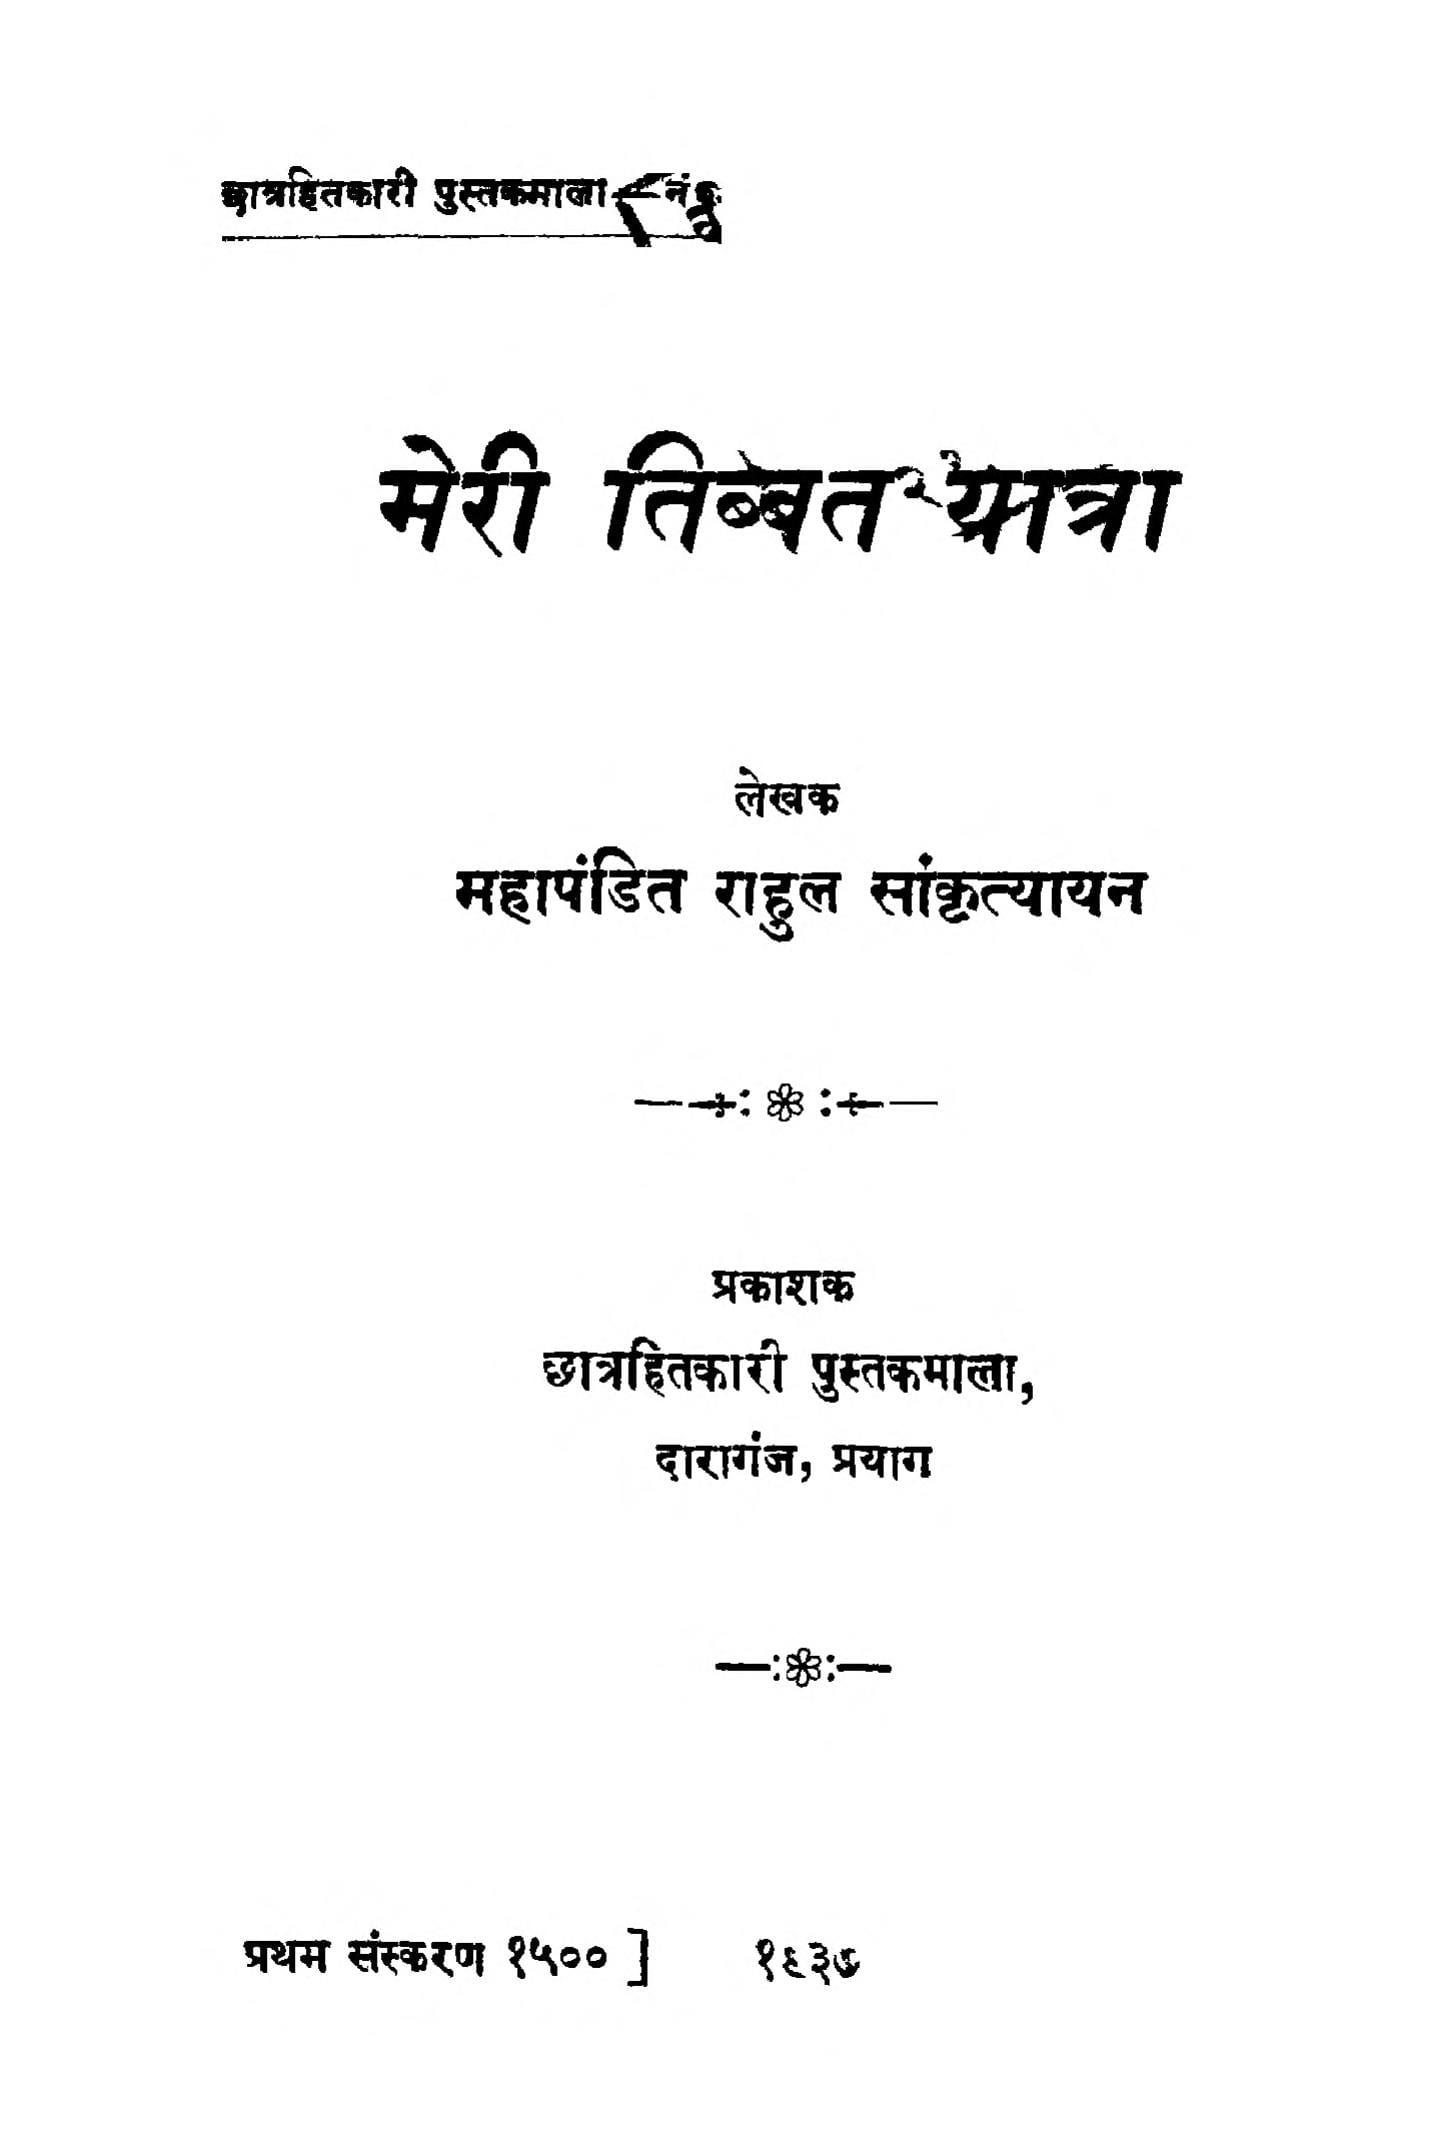 Meri Tibbat Yatra Ac 502 by राहुल सांकृत्यायन - Rahul Sankrityayan